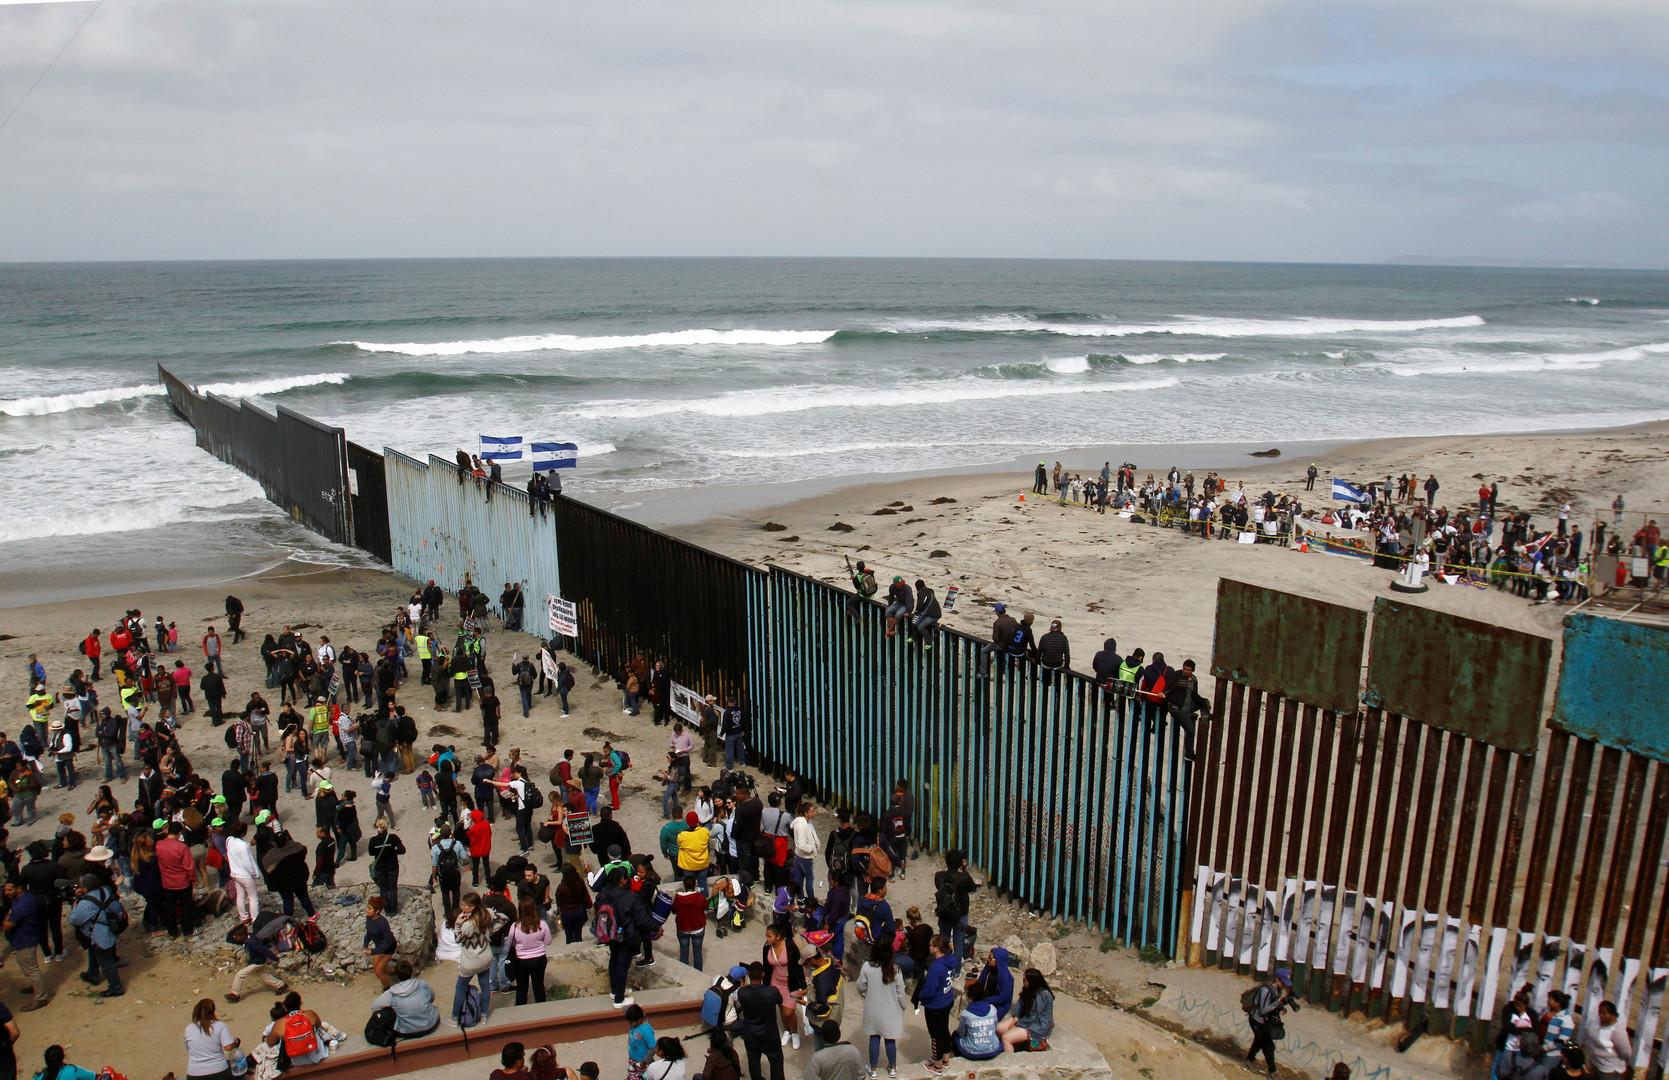 Migranten versammeln sich am Grenzzaun, Tijuana, Mexiko, 29. April 2018.